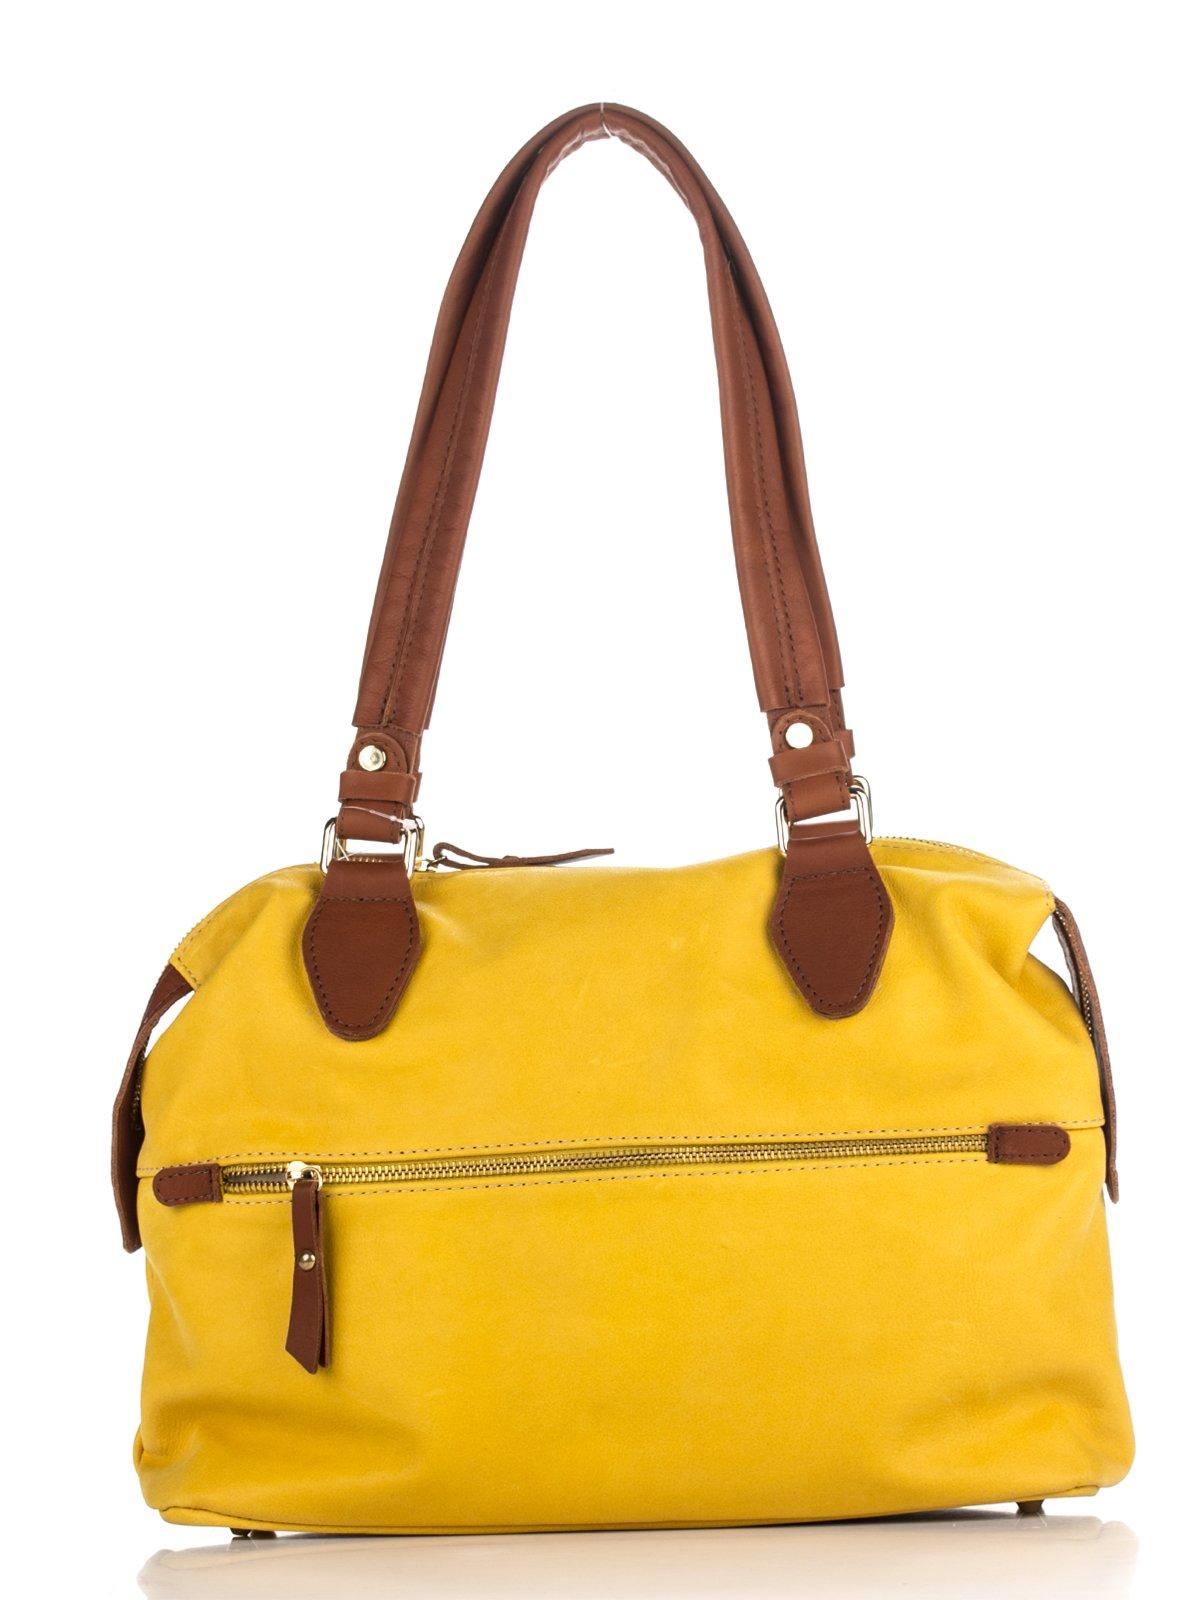 Сумка желто-коричневая | 3173305